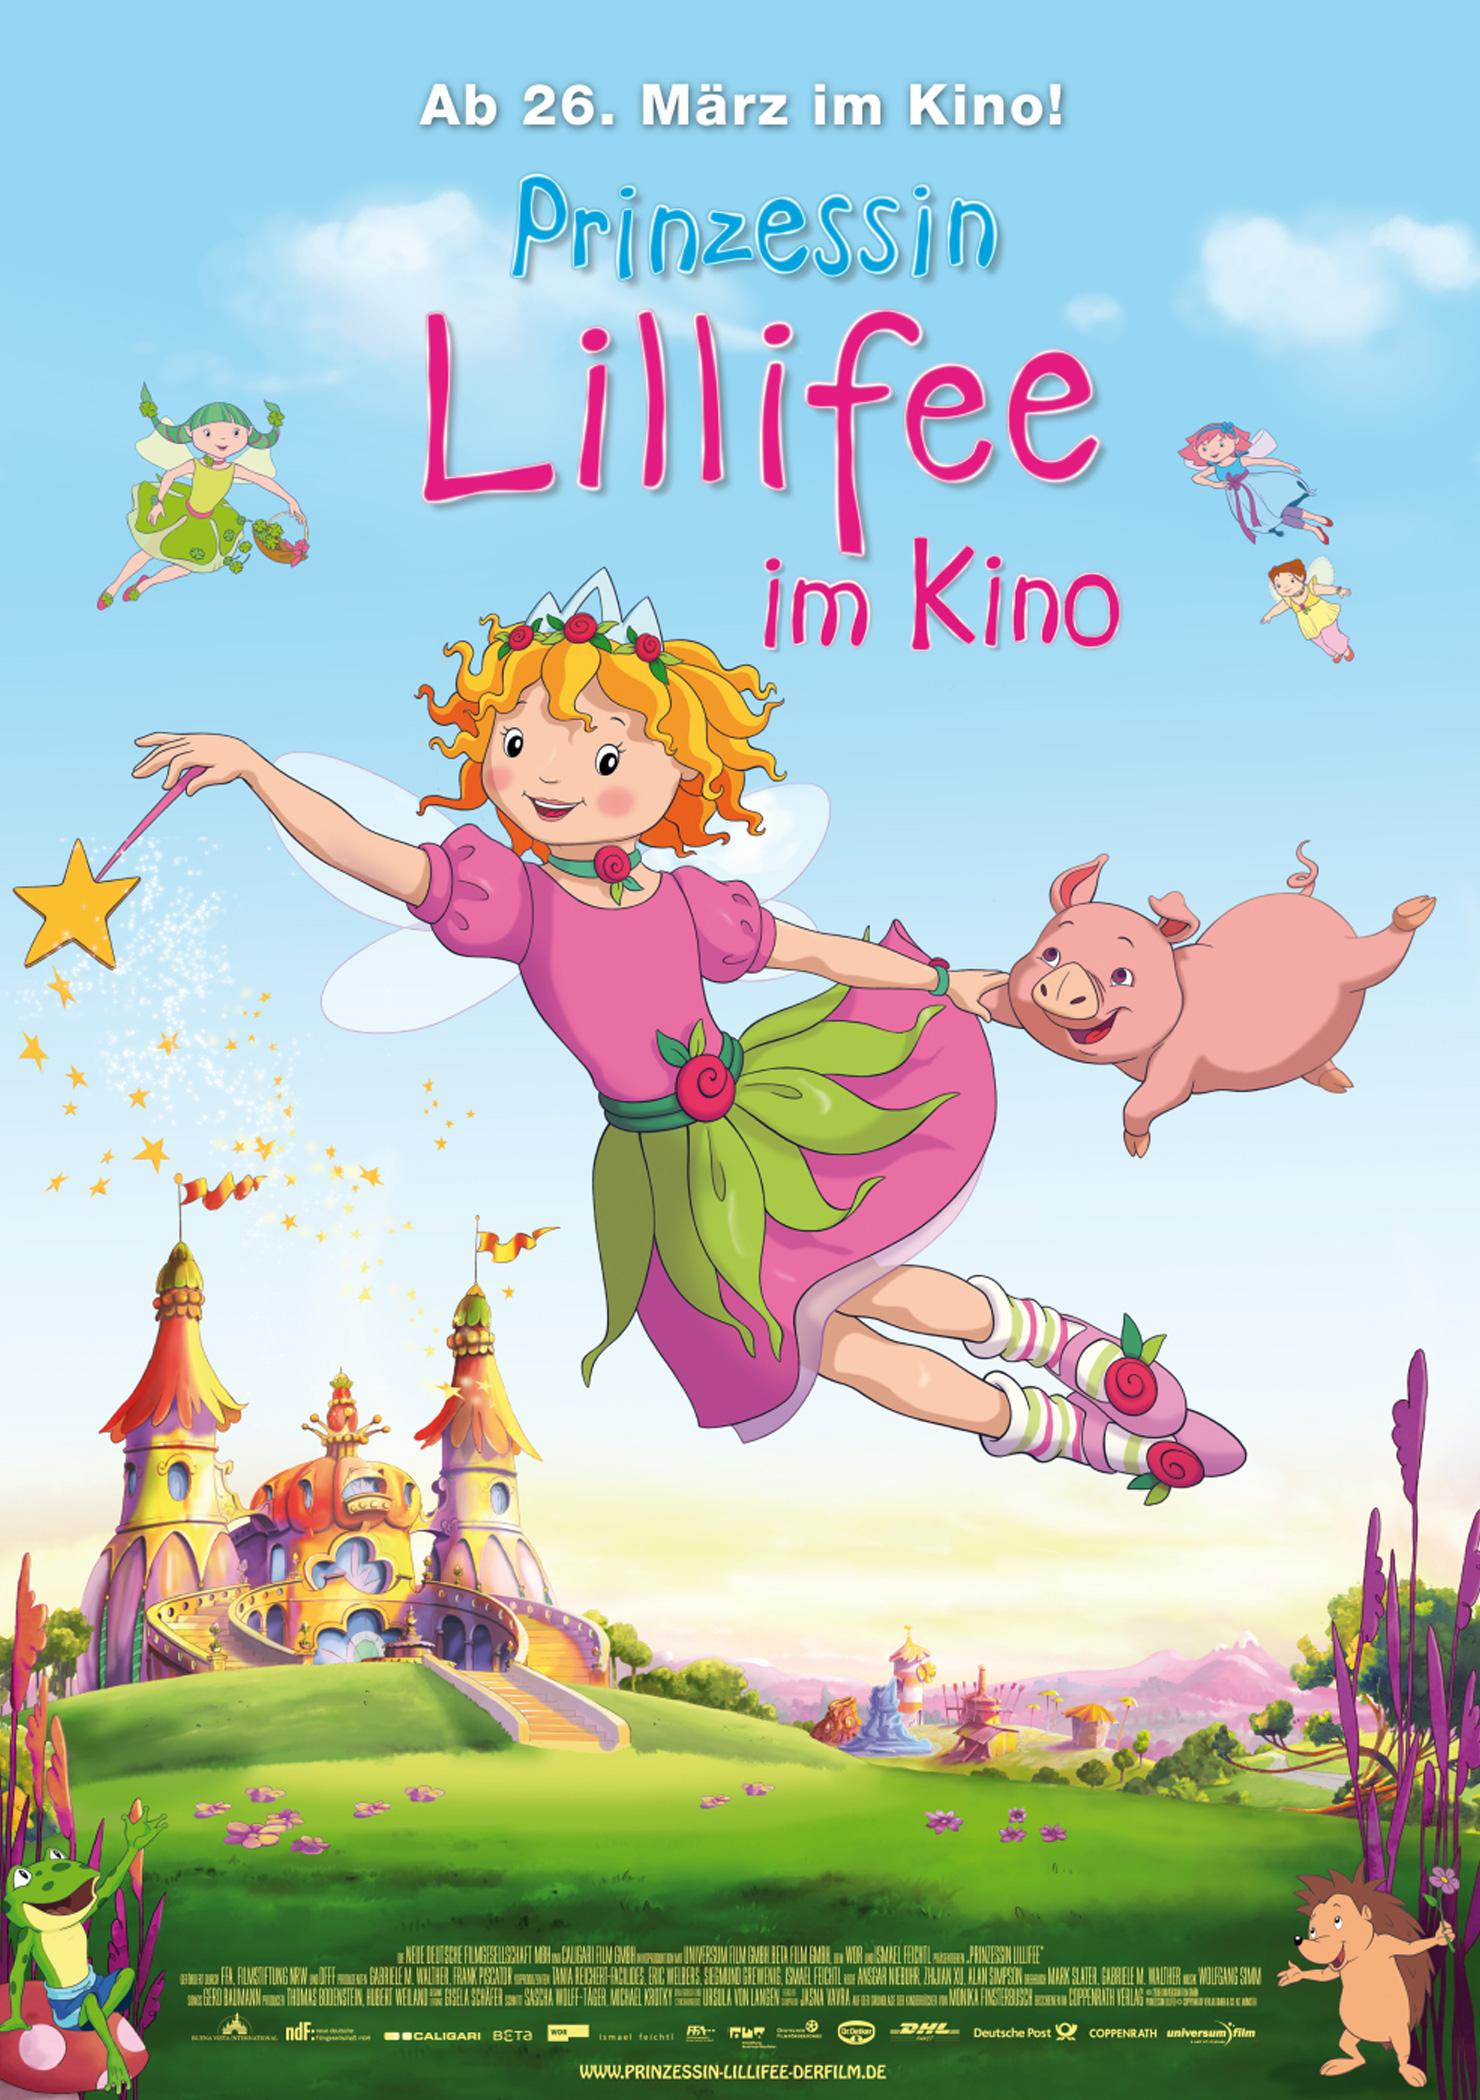 Prinzessin Lillifee (Poster)